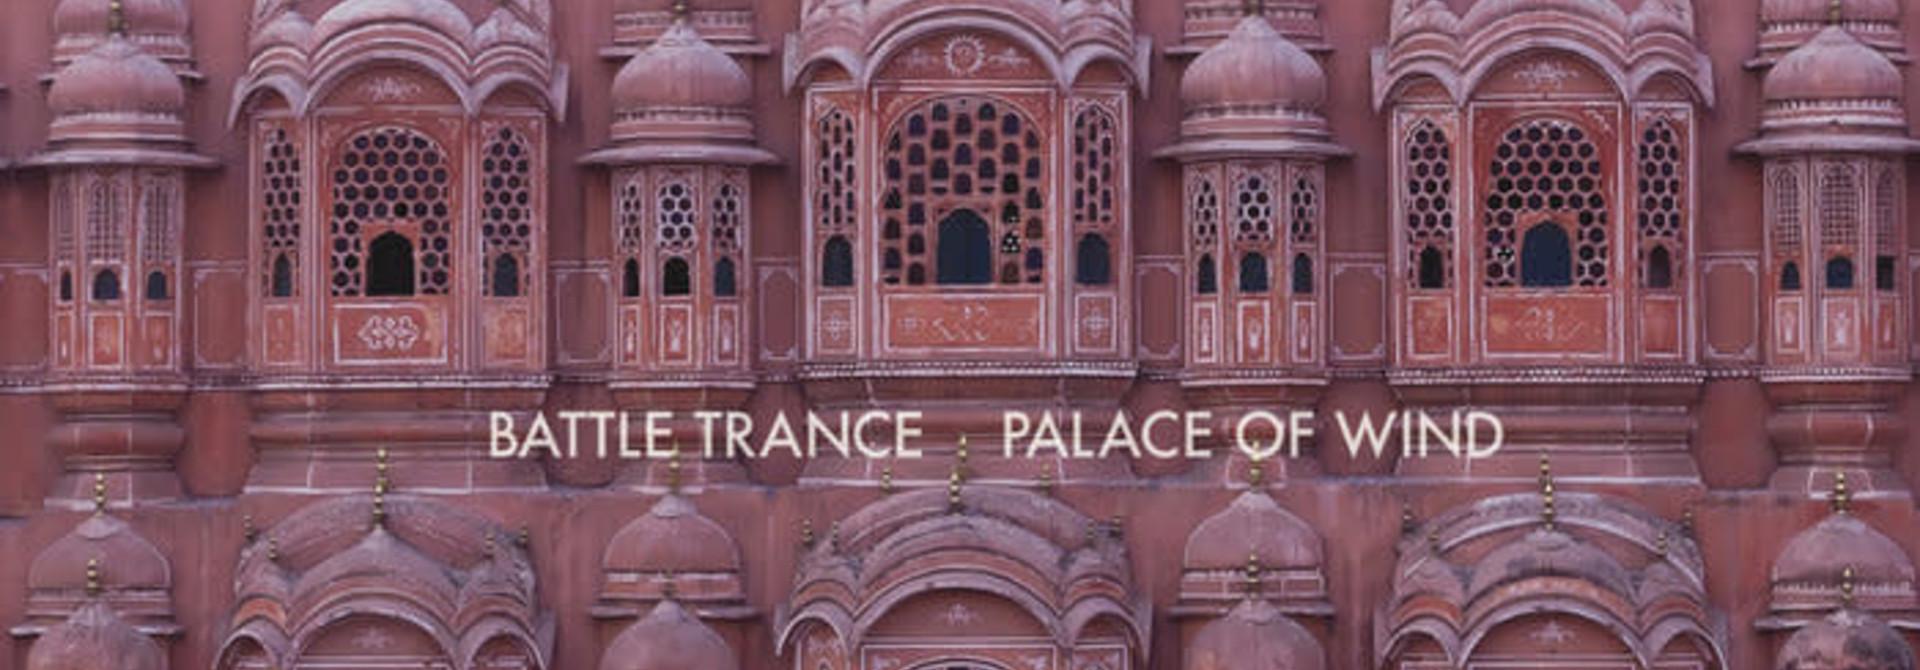 Battle Trance • Palace Of Wind